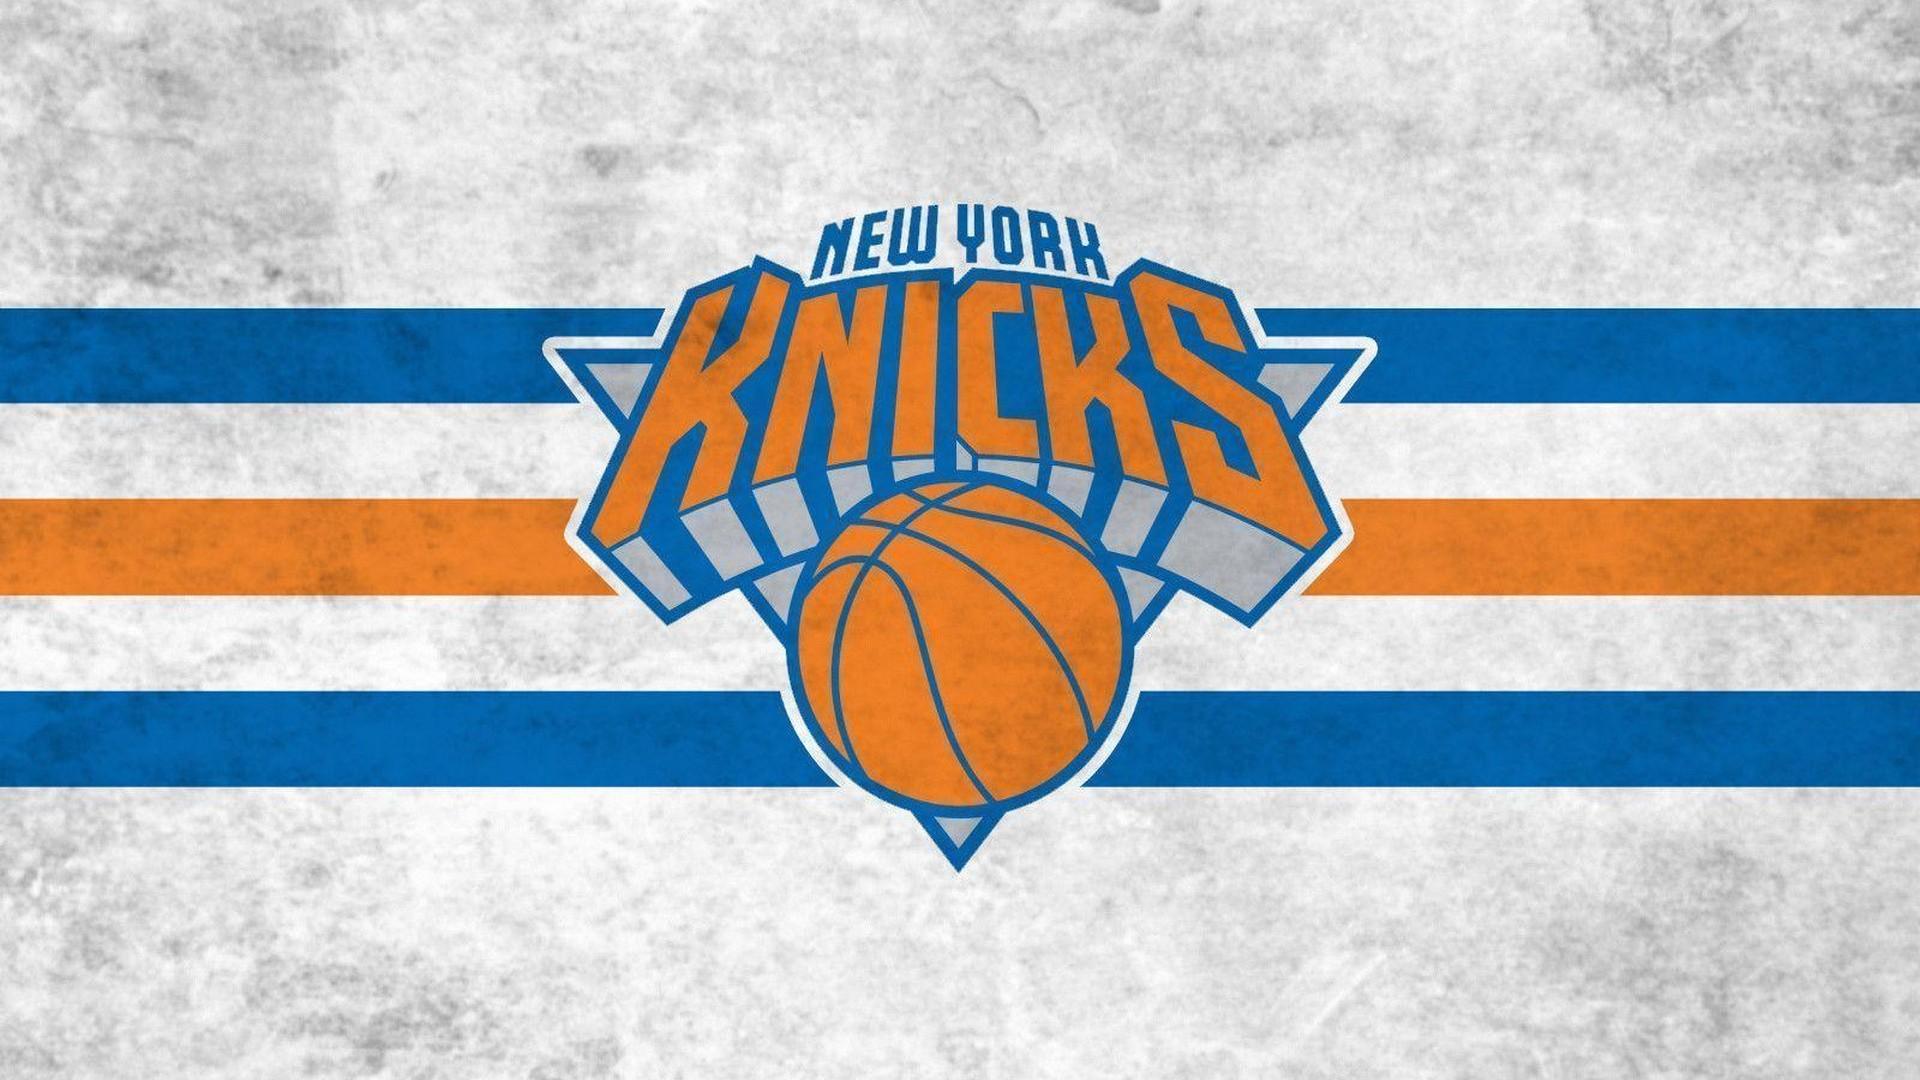 Res: 1920x1080, New York Knicks Wallpaper HD